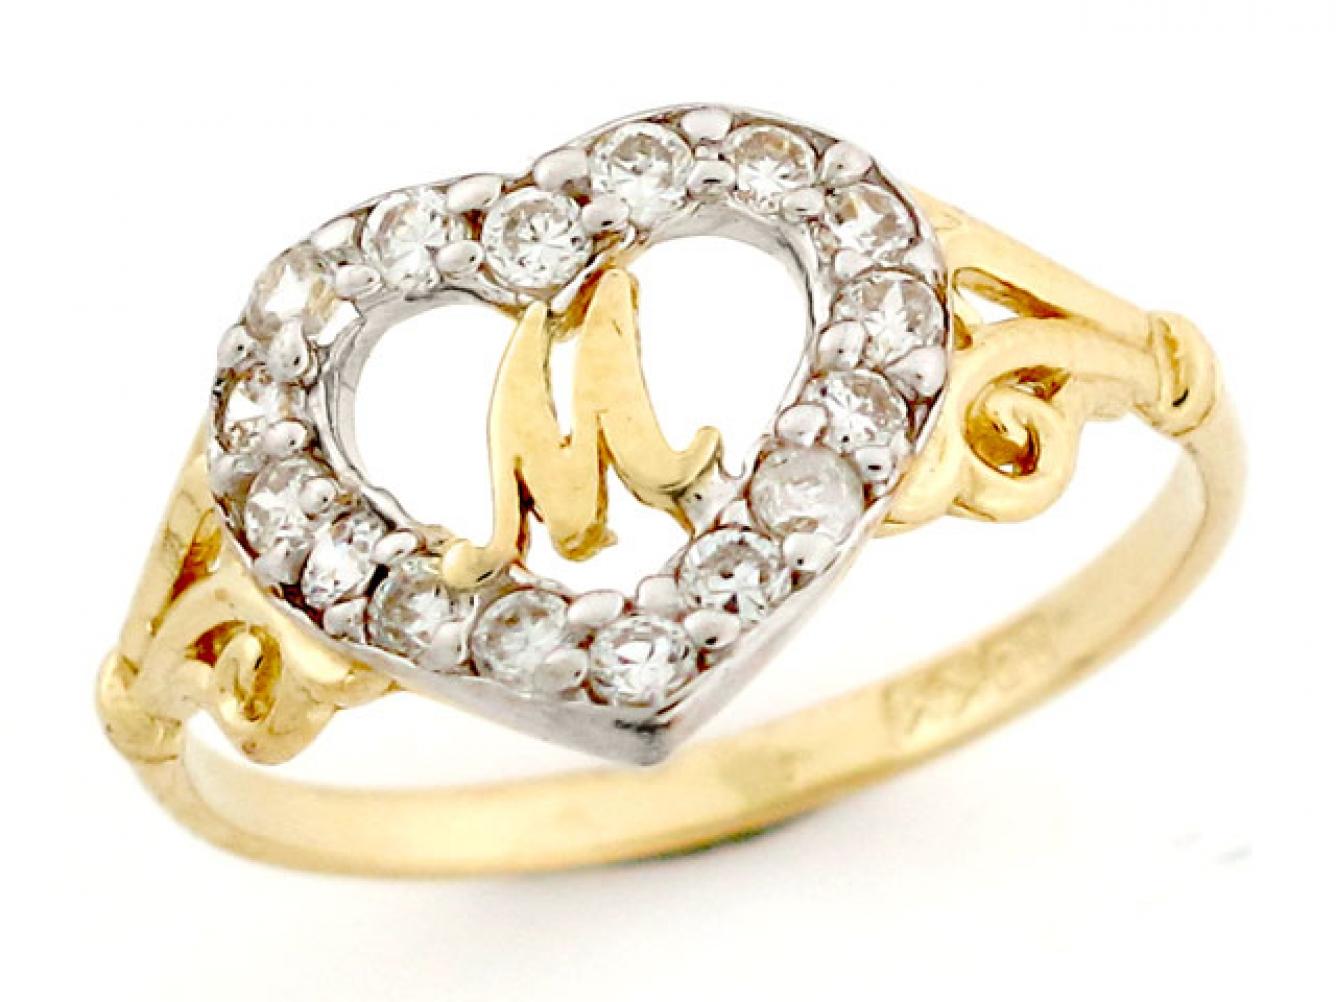 M Letter In Ring 10k / 14k Gold ...